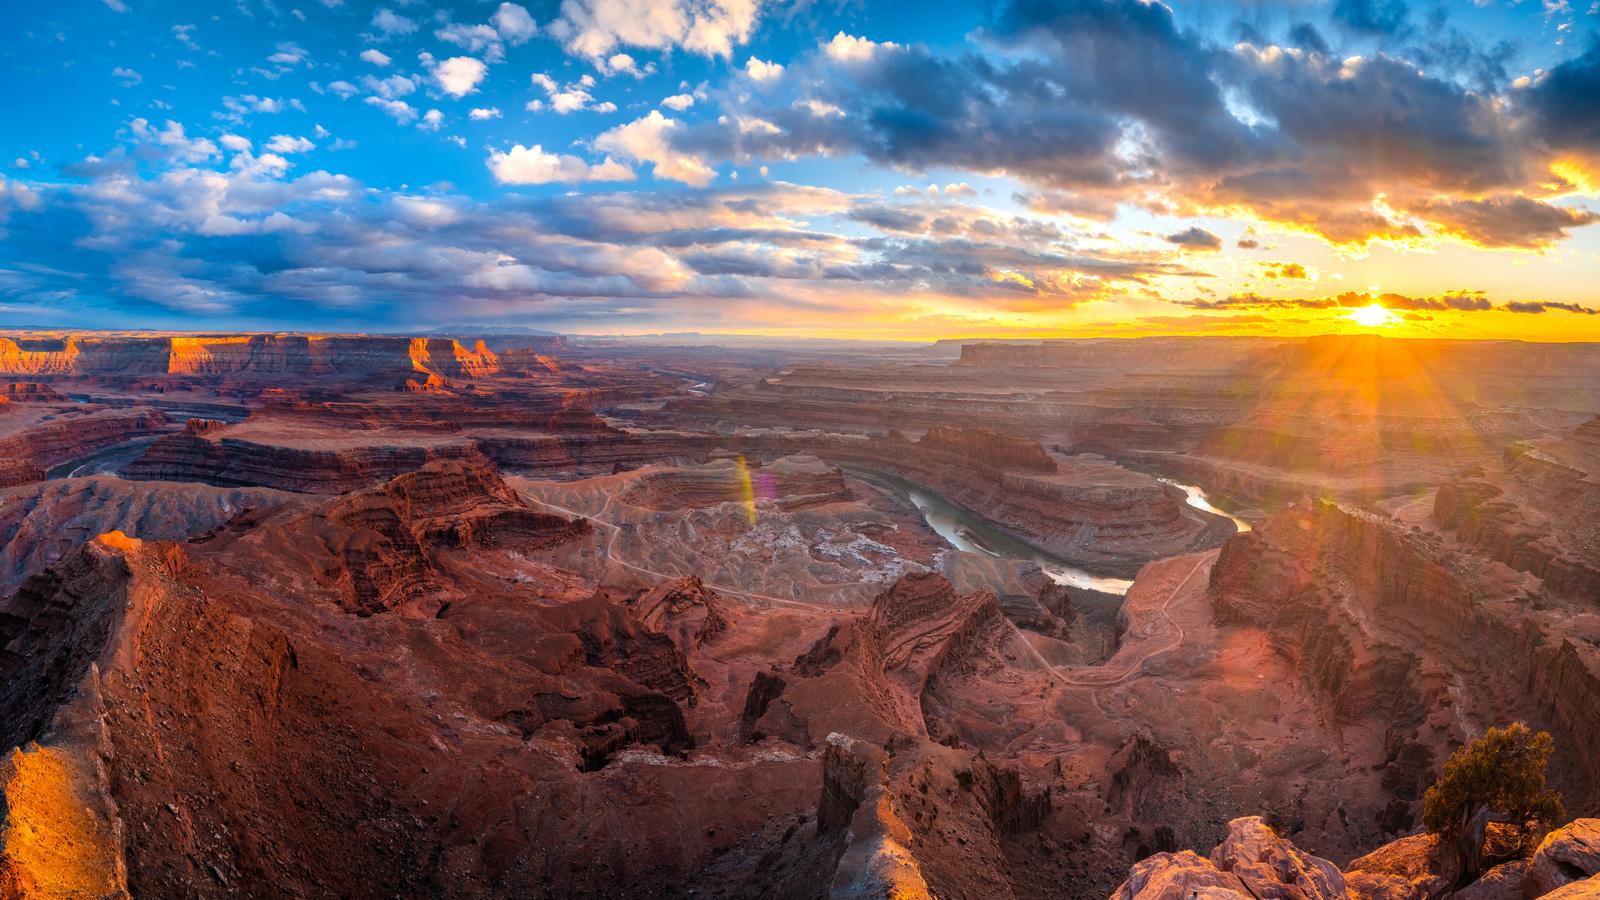 широкоформатные, гранд-каньон, пейзаж, arizona, panorama, скала, снег, башня, природа